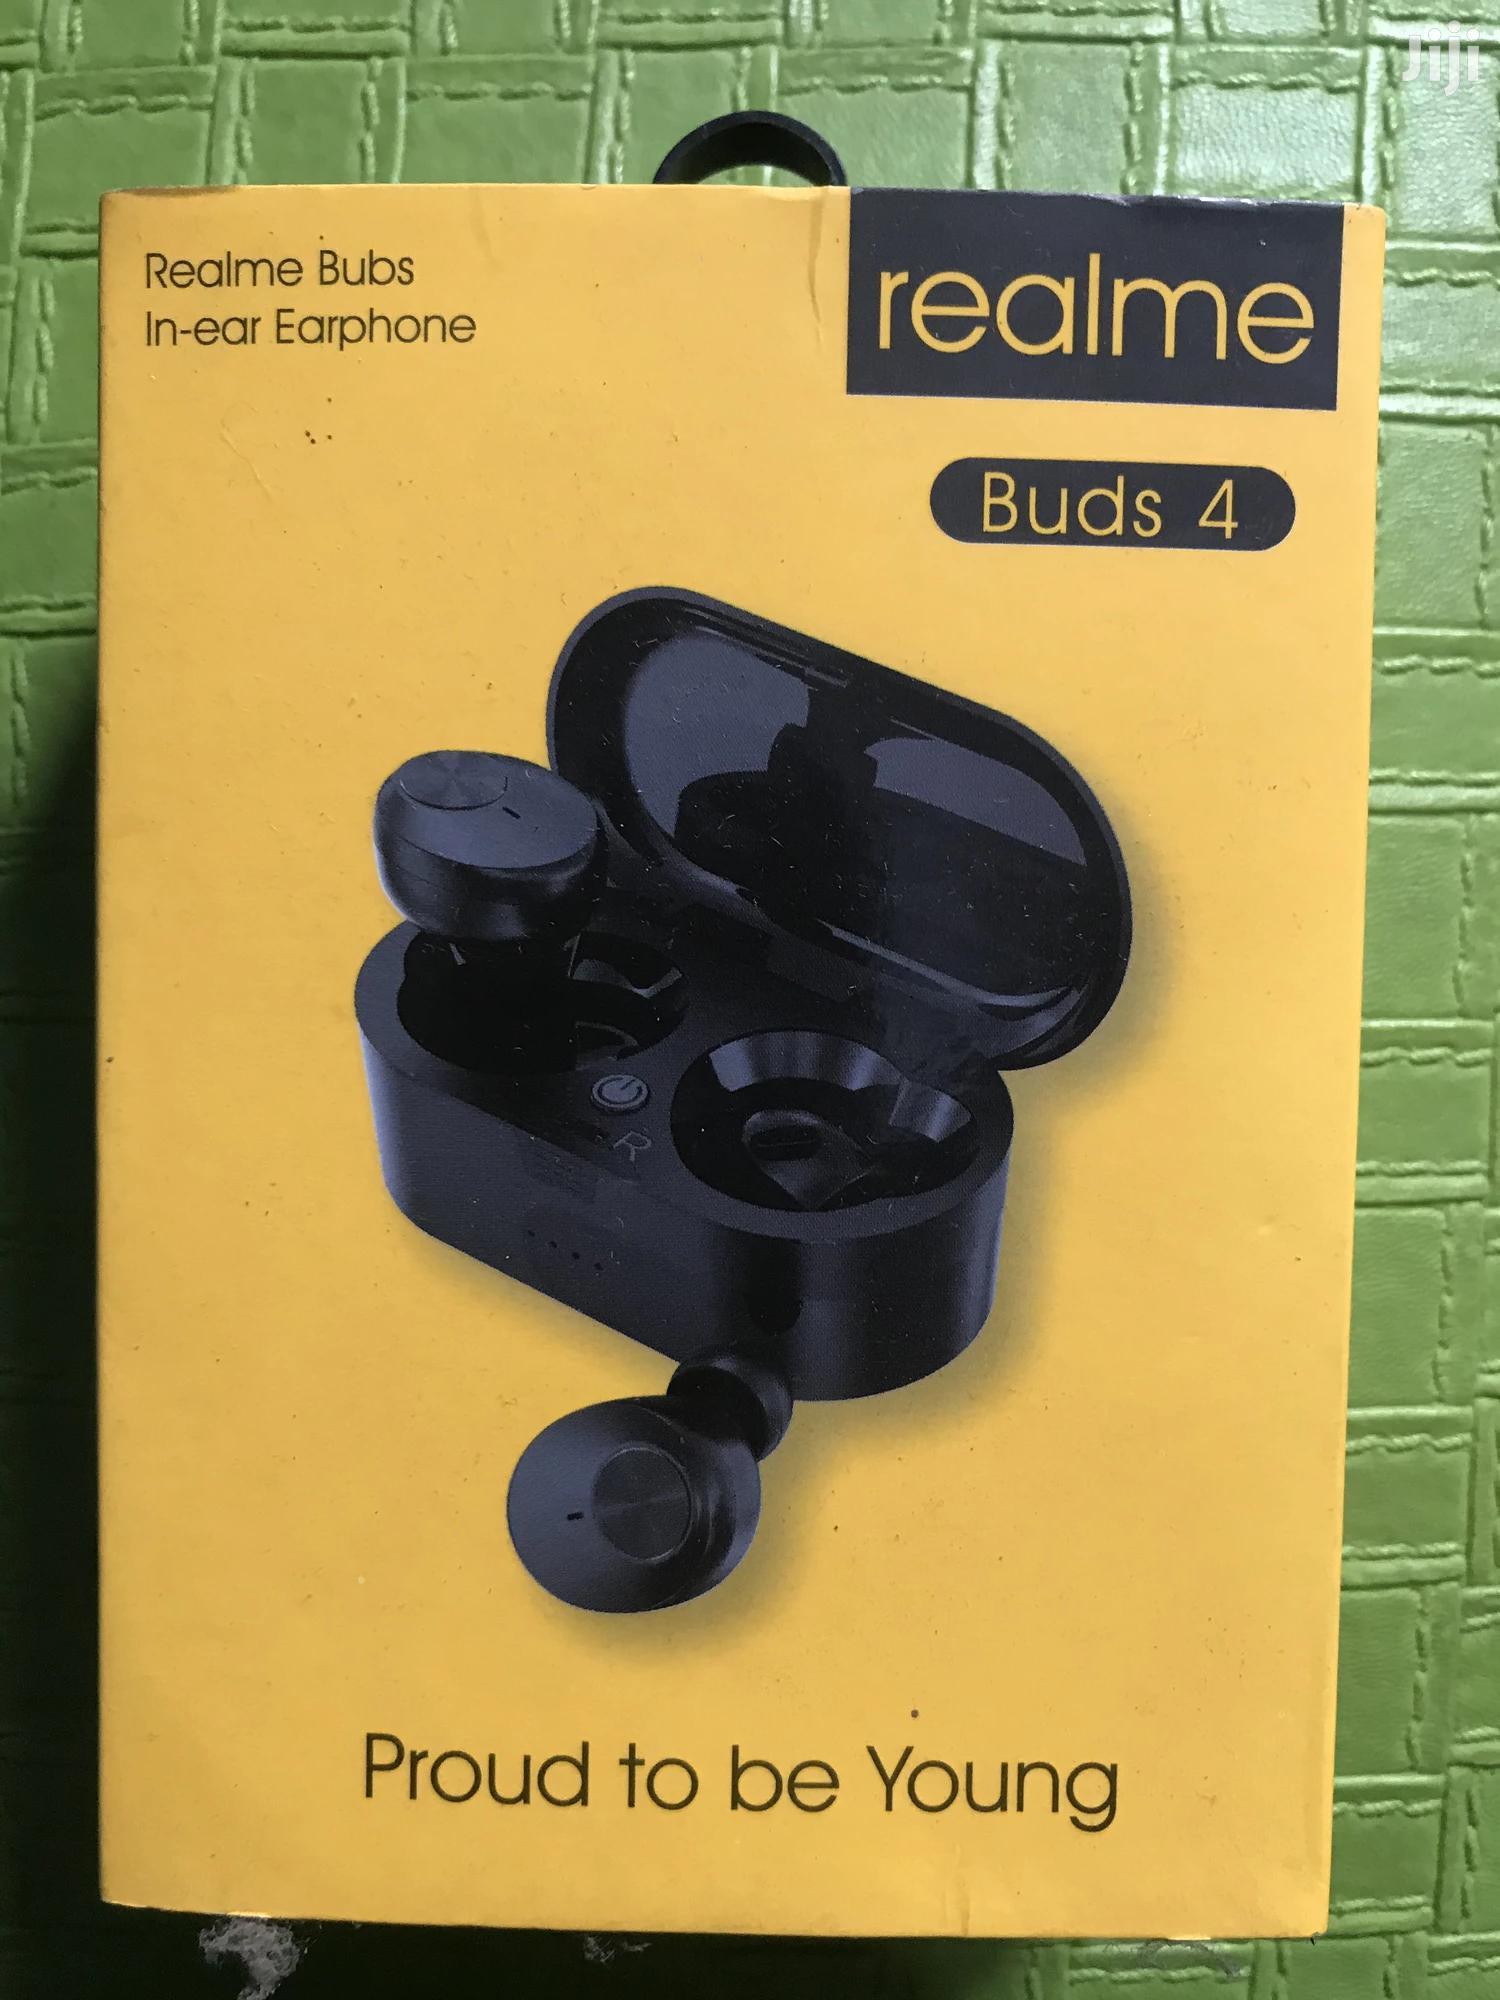 Realme Buds 4